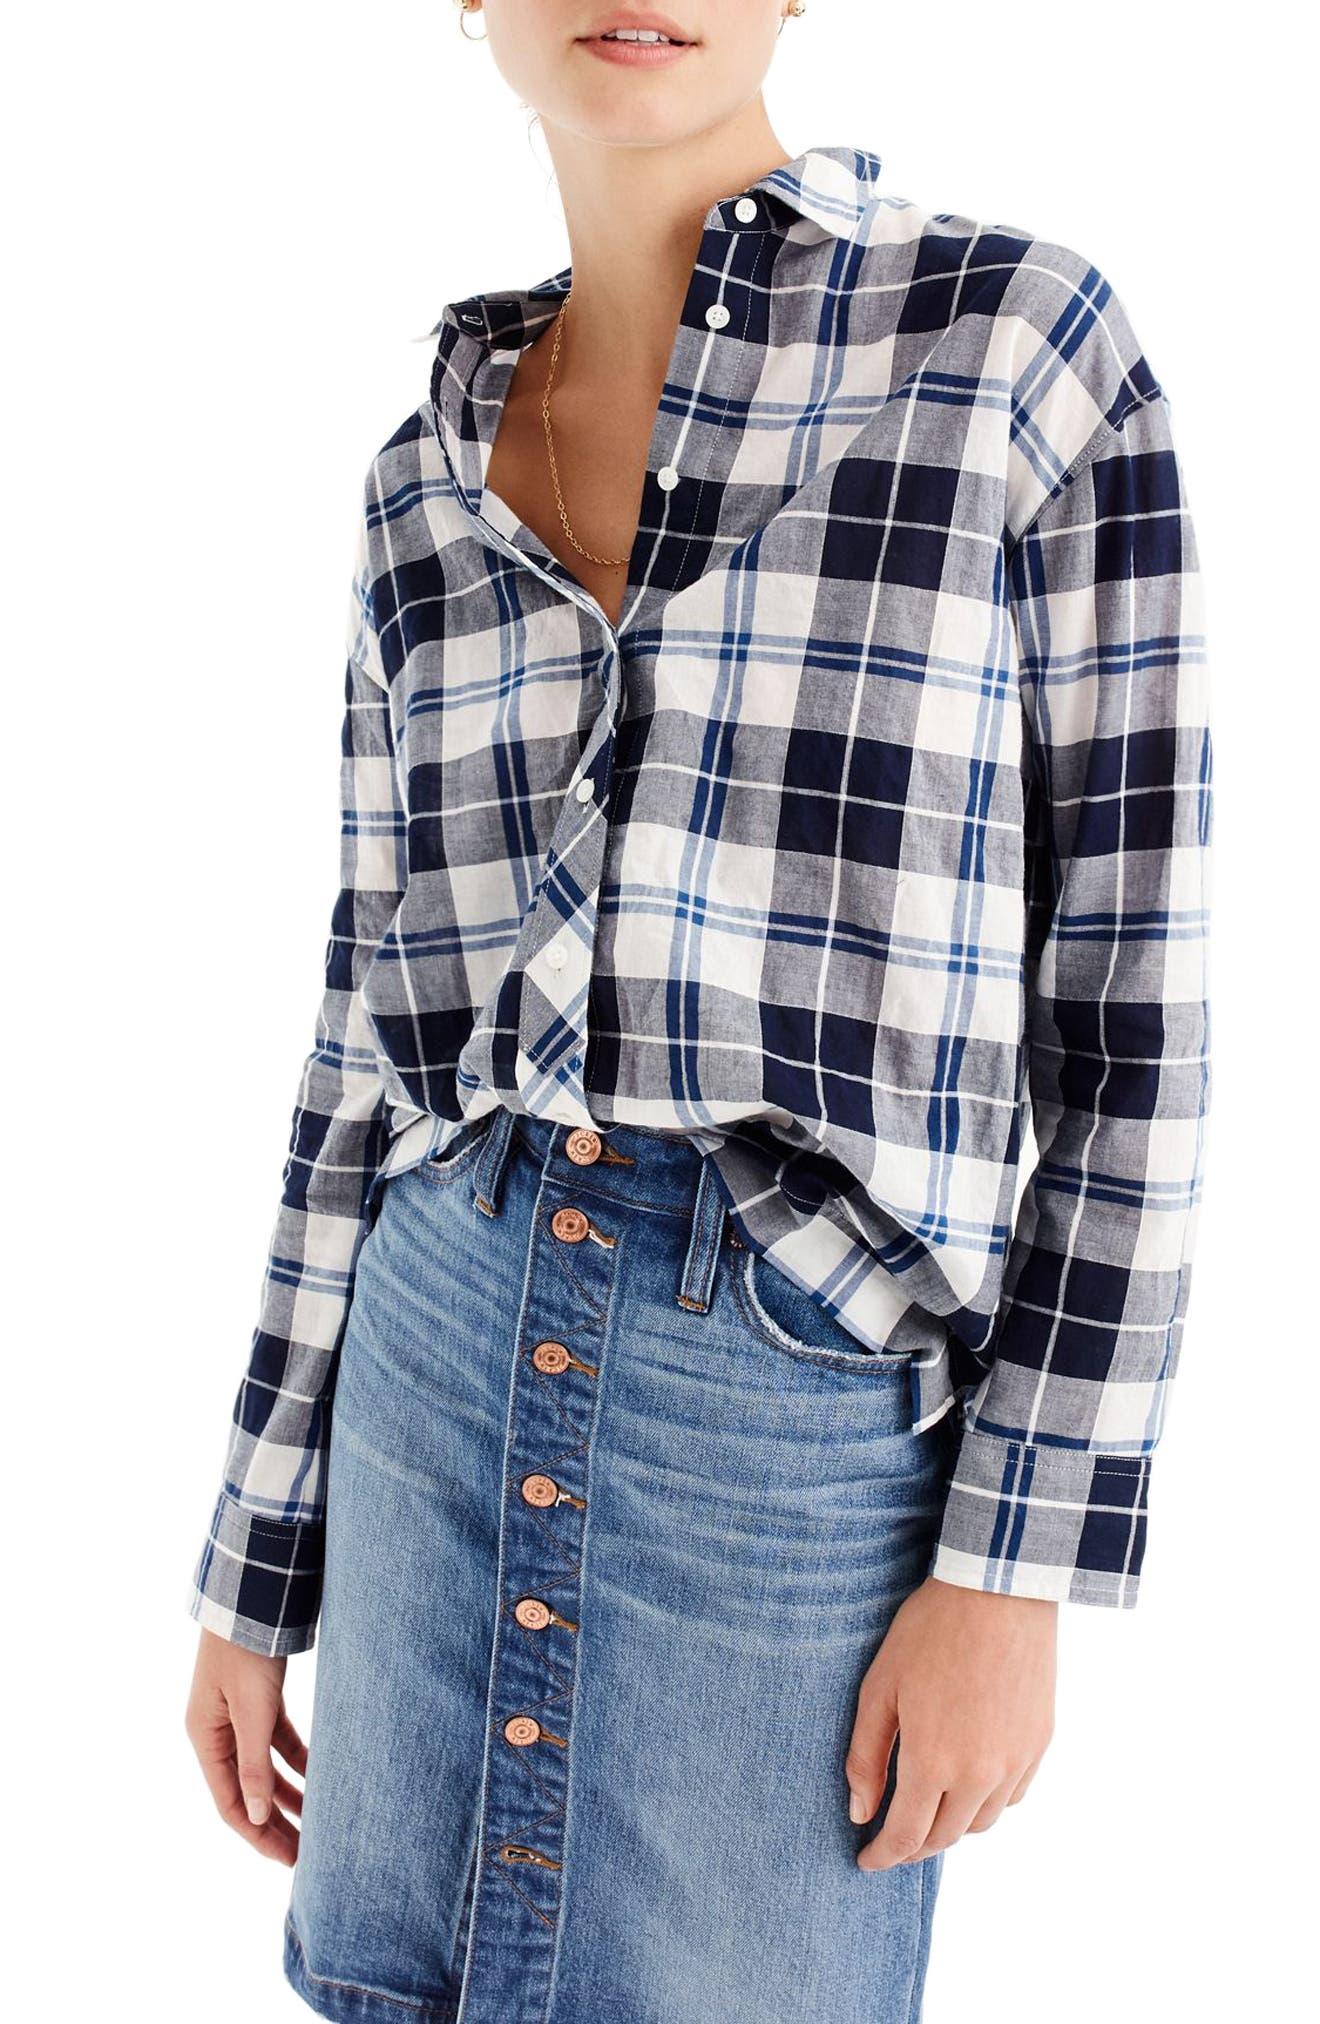 J.Crew Plaid Boy Shirt